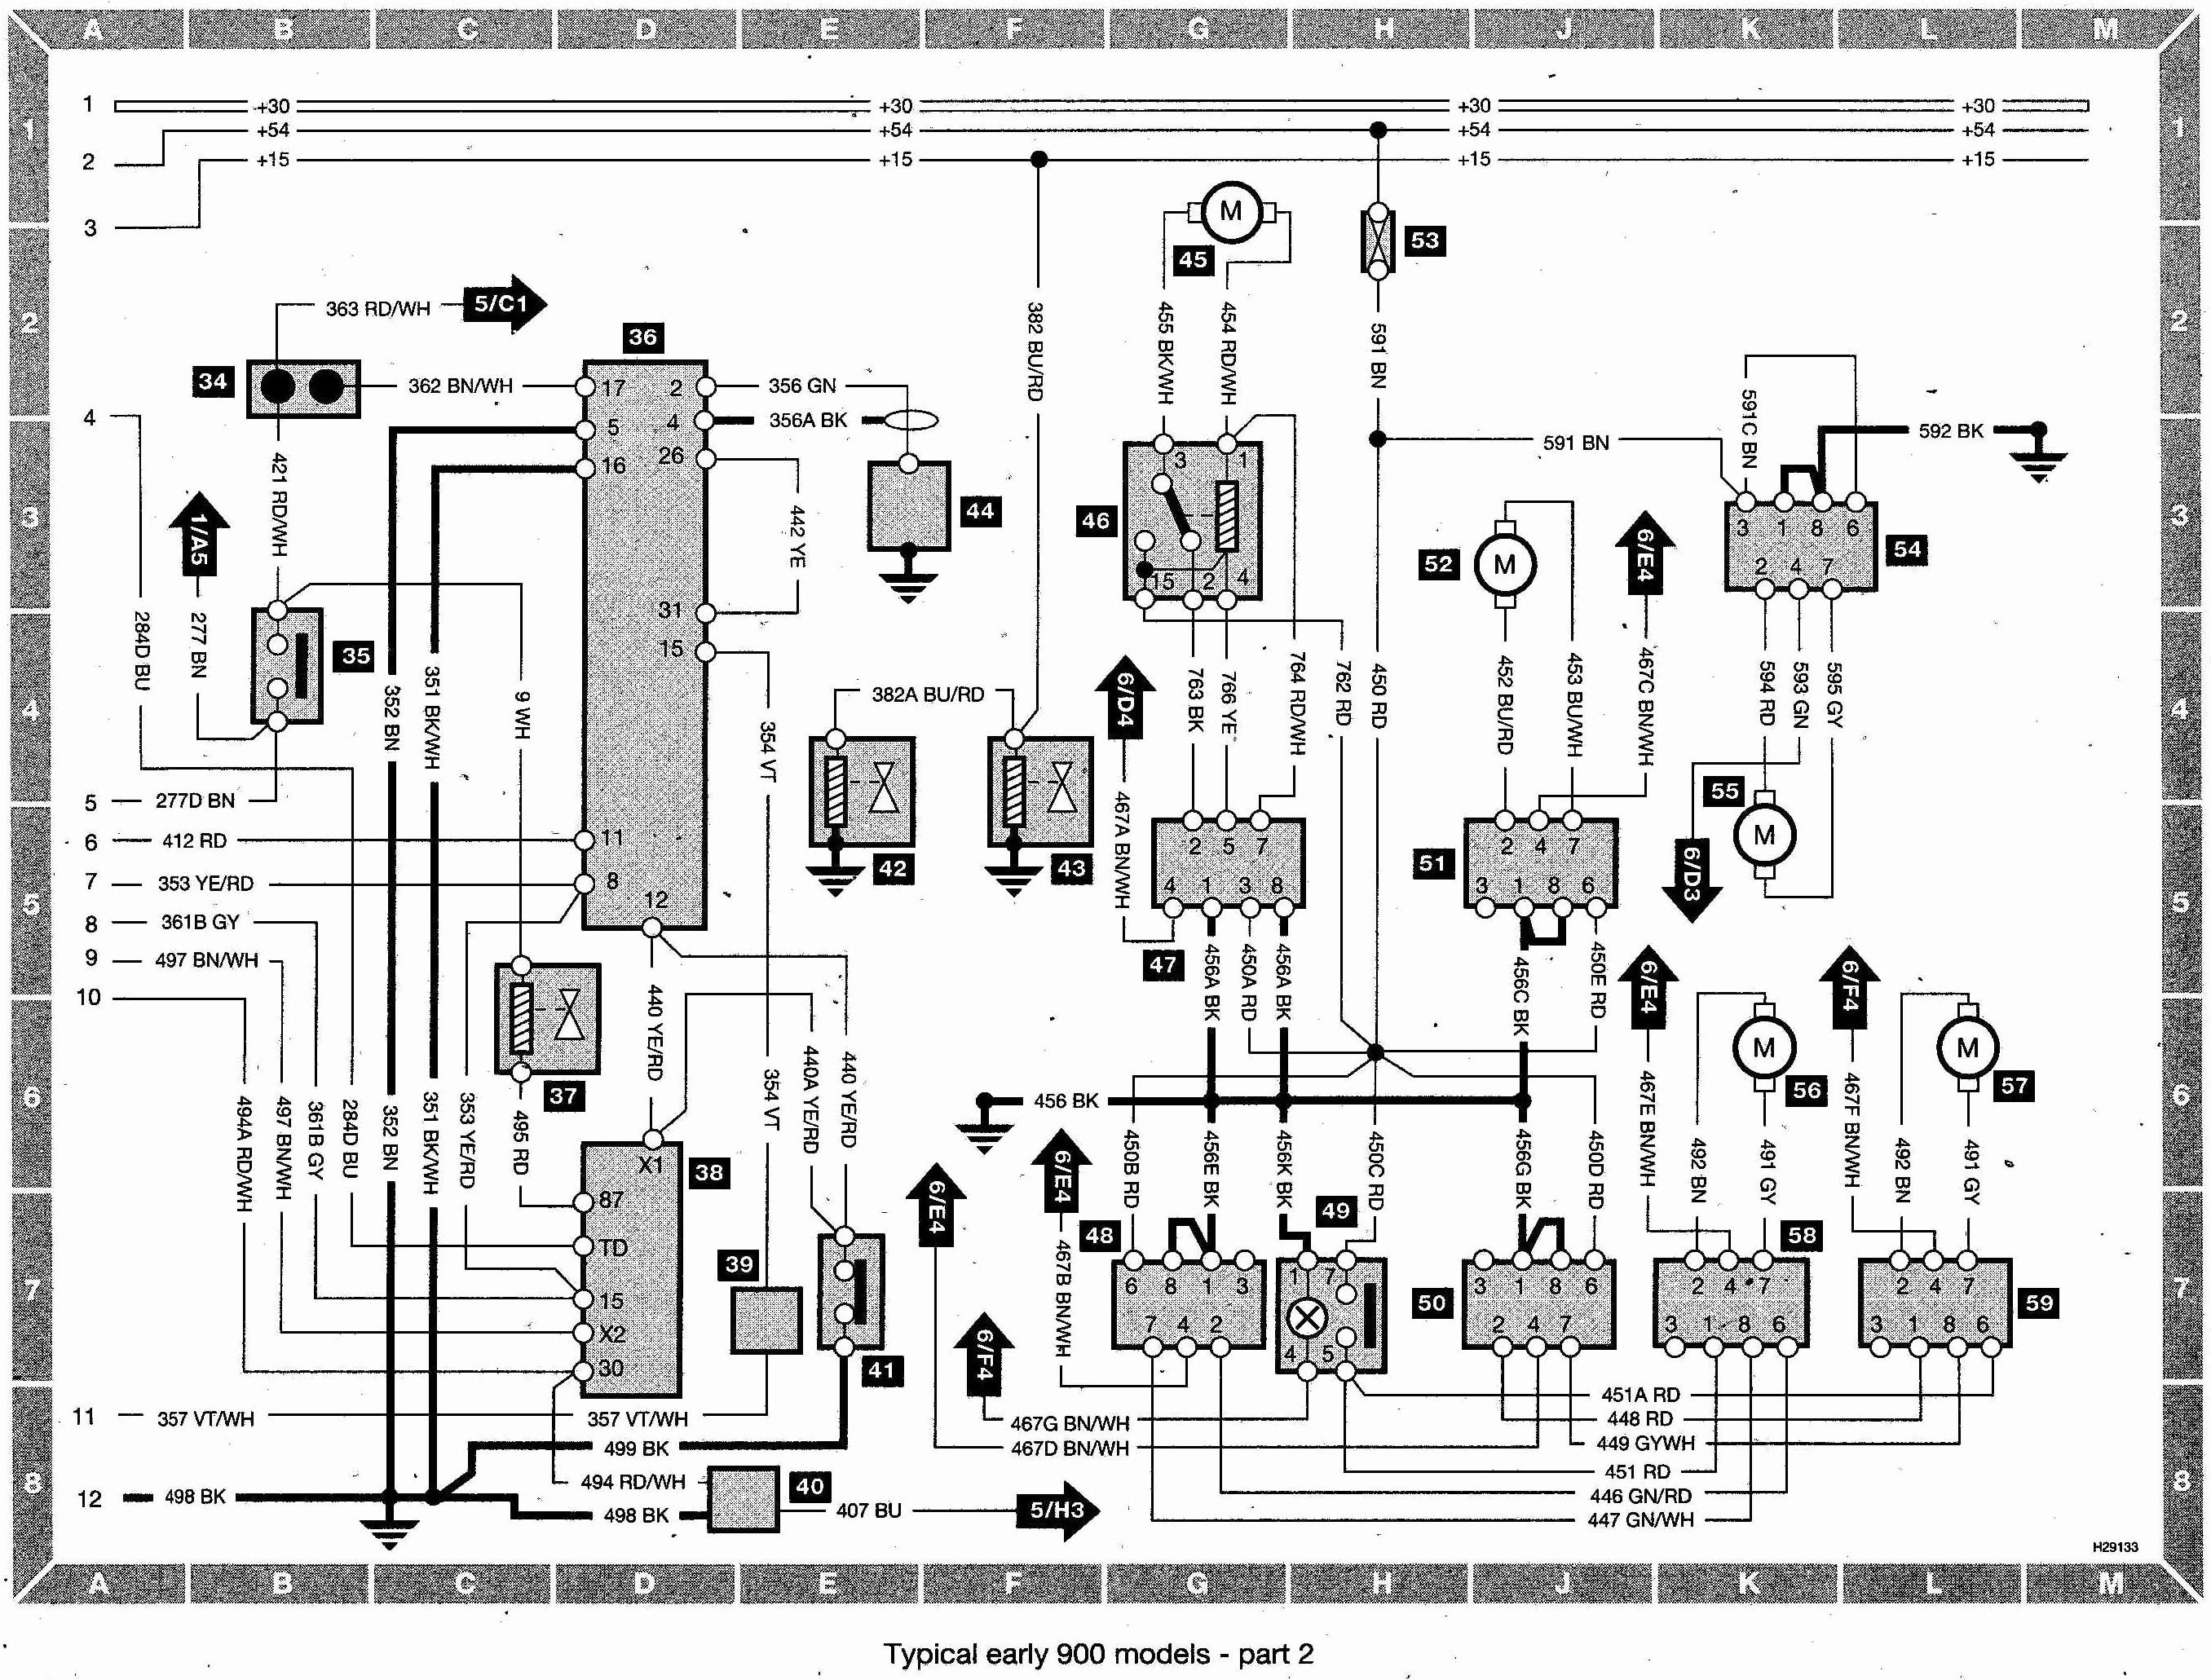 1992 saab 900 wiring harness - wiring diagram shop-data-b -  shop-data-b.disnar.it  disnar.it